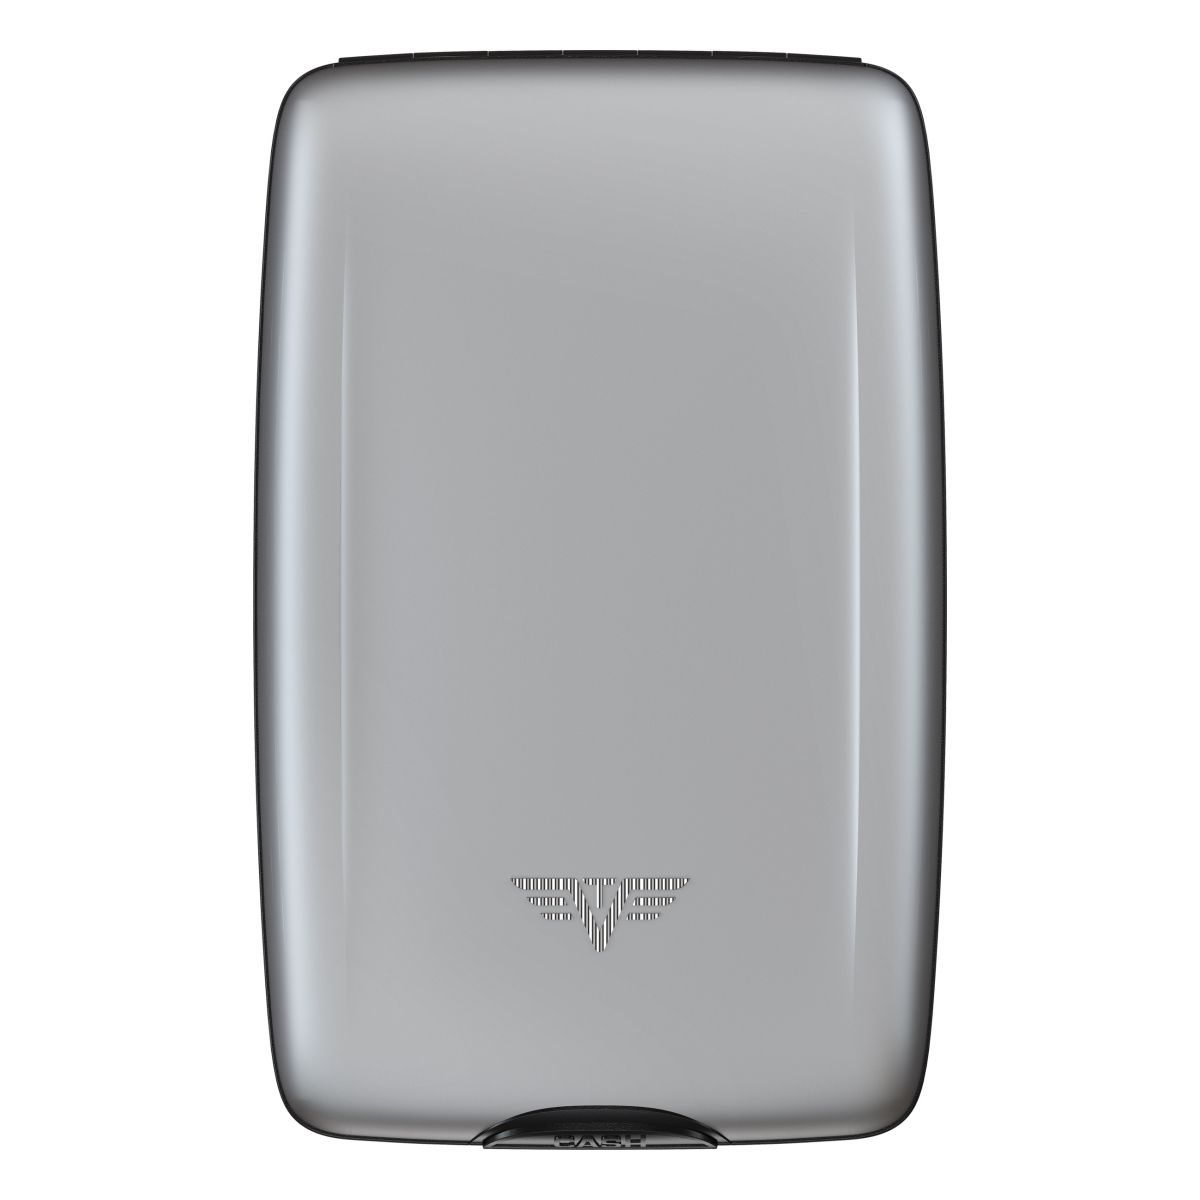 TRU VIRTU Aluminum Wallet Oyster Cash & Cards - Silk Line - Silver